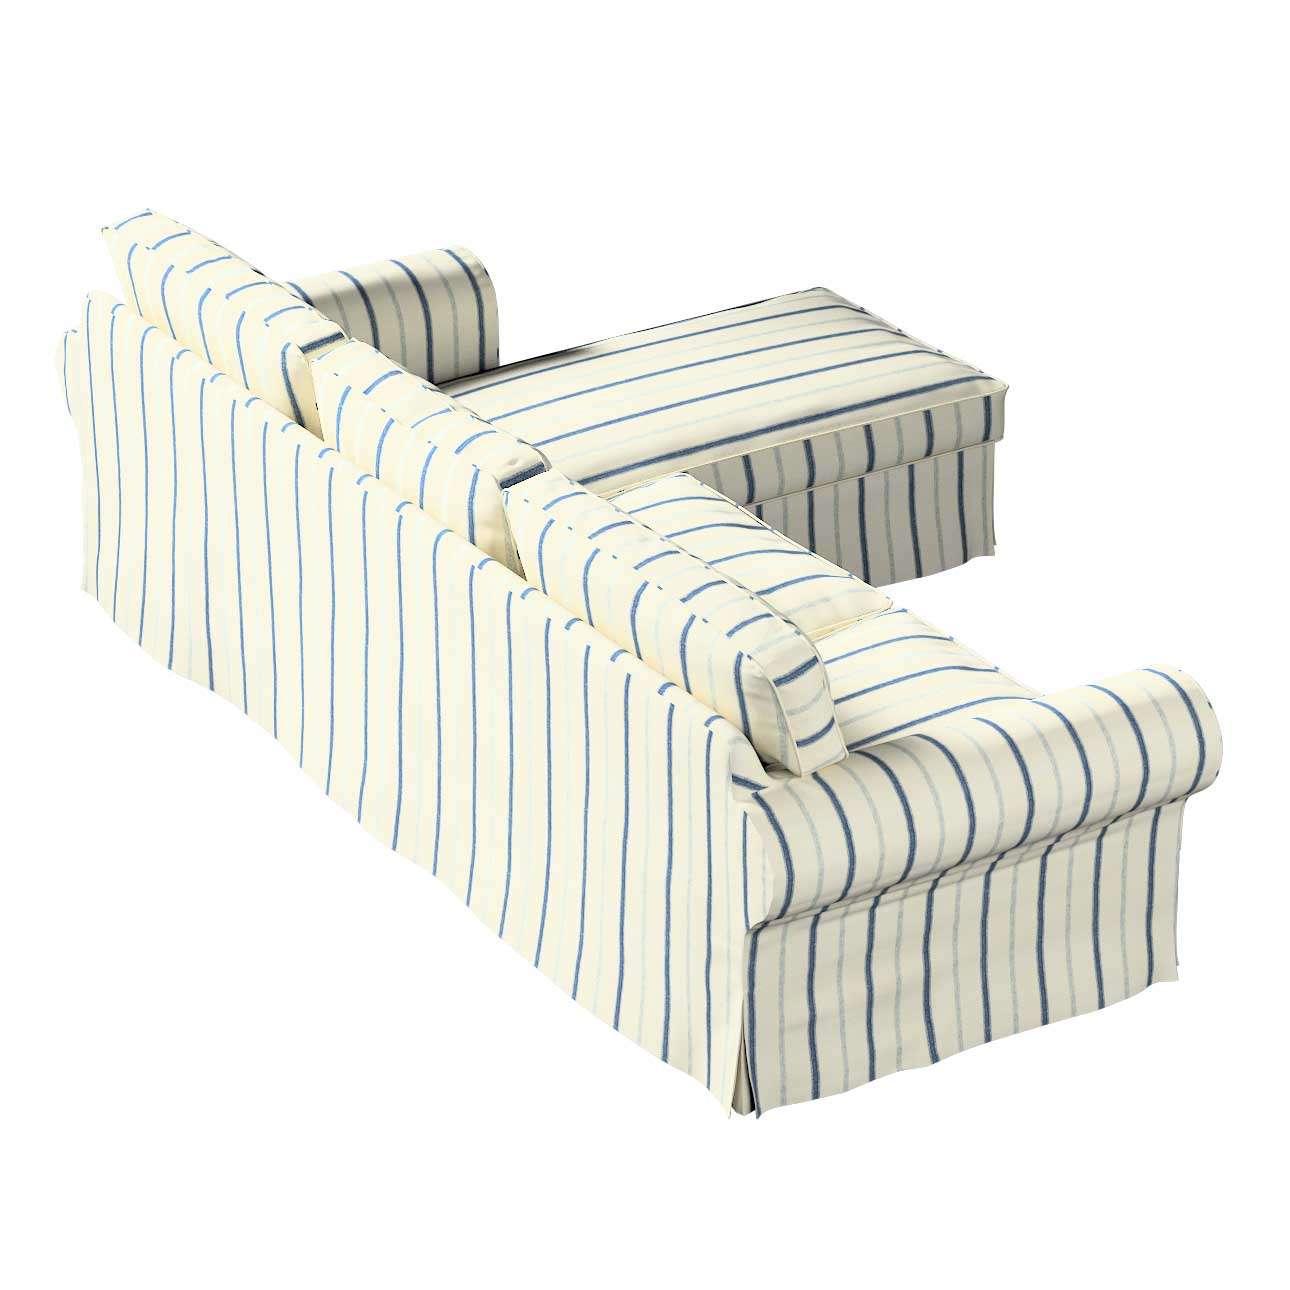 Potah na pohovku IKEA Ektorp 2-místná se šezlongem sofa ektorp 2-0s. i leżanka v kolekci Avignon, látka: 129-66